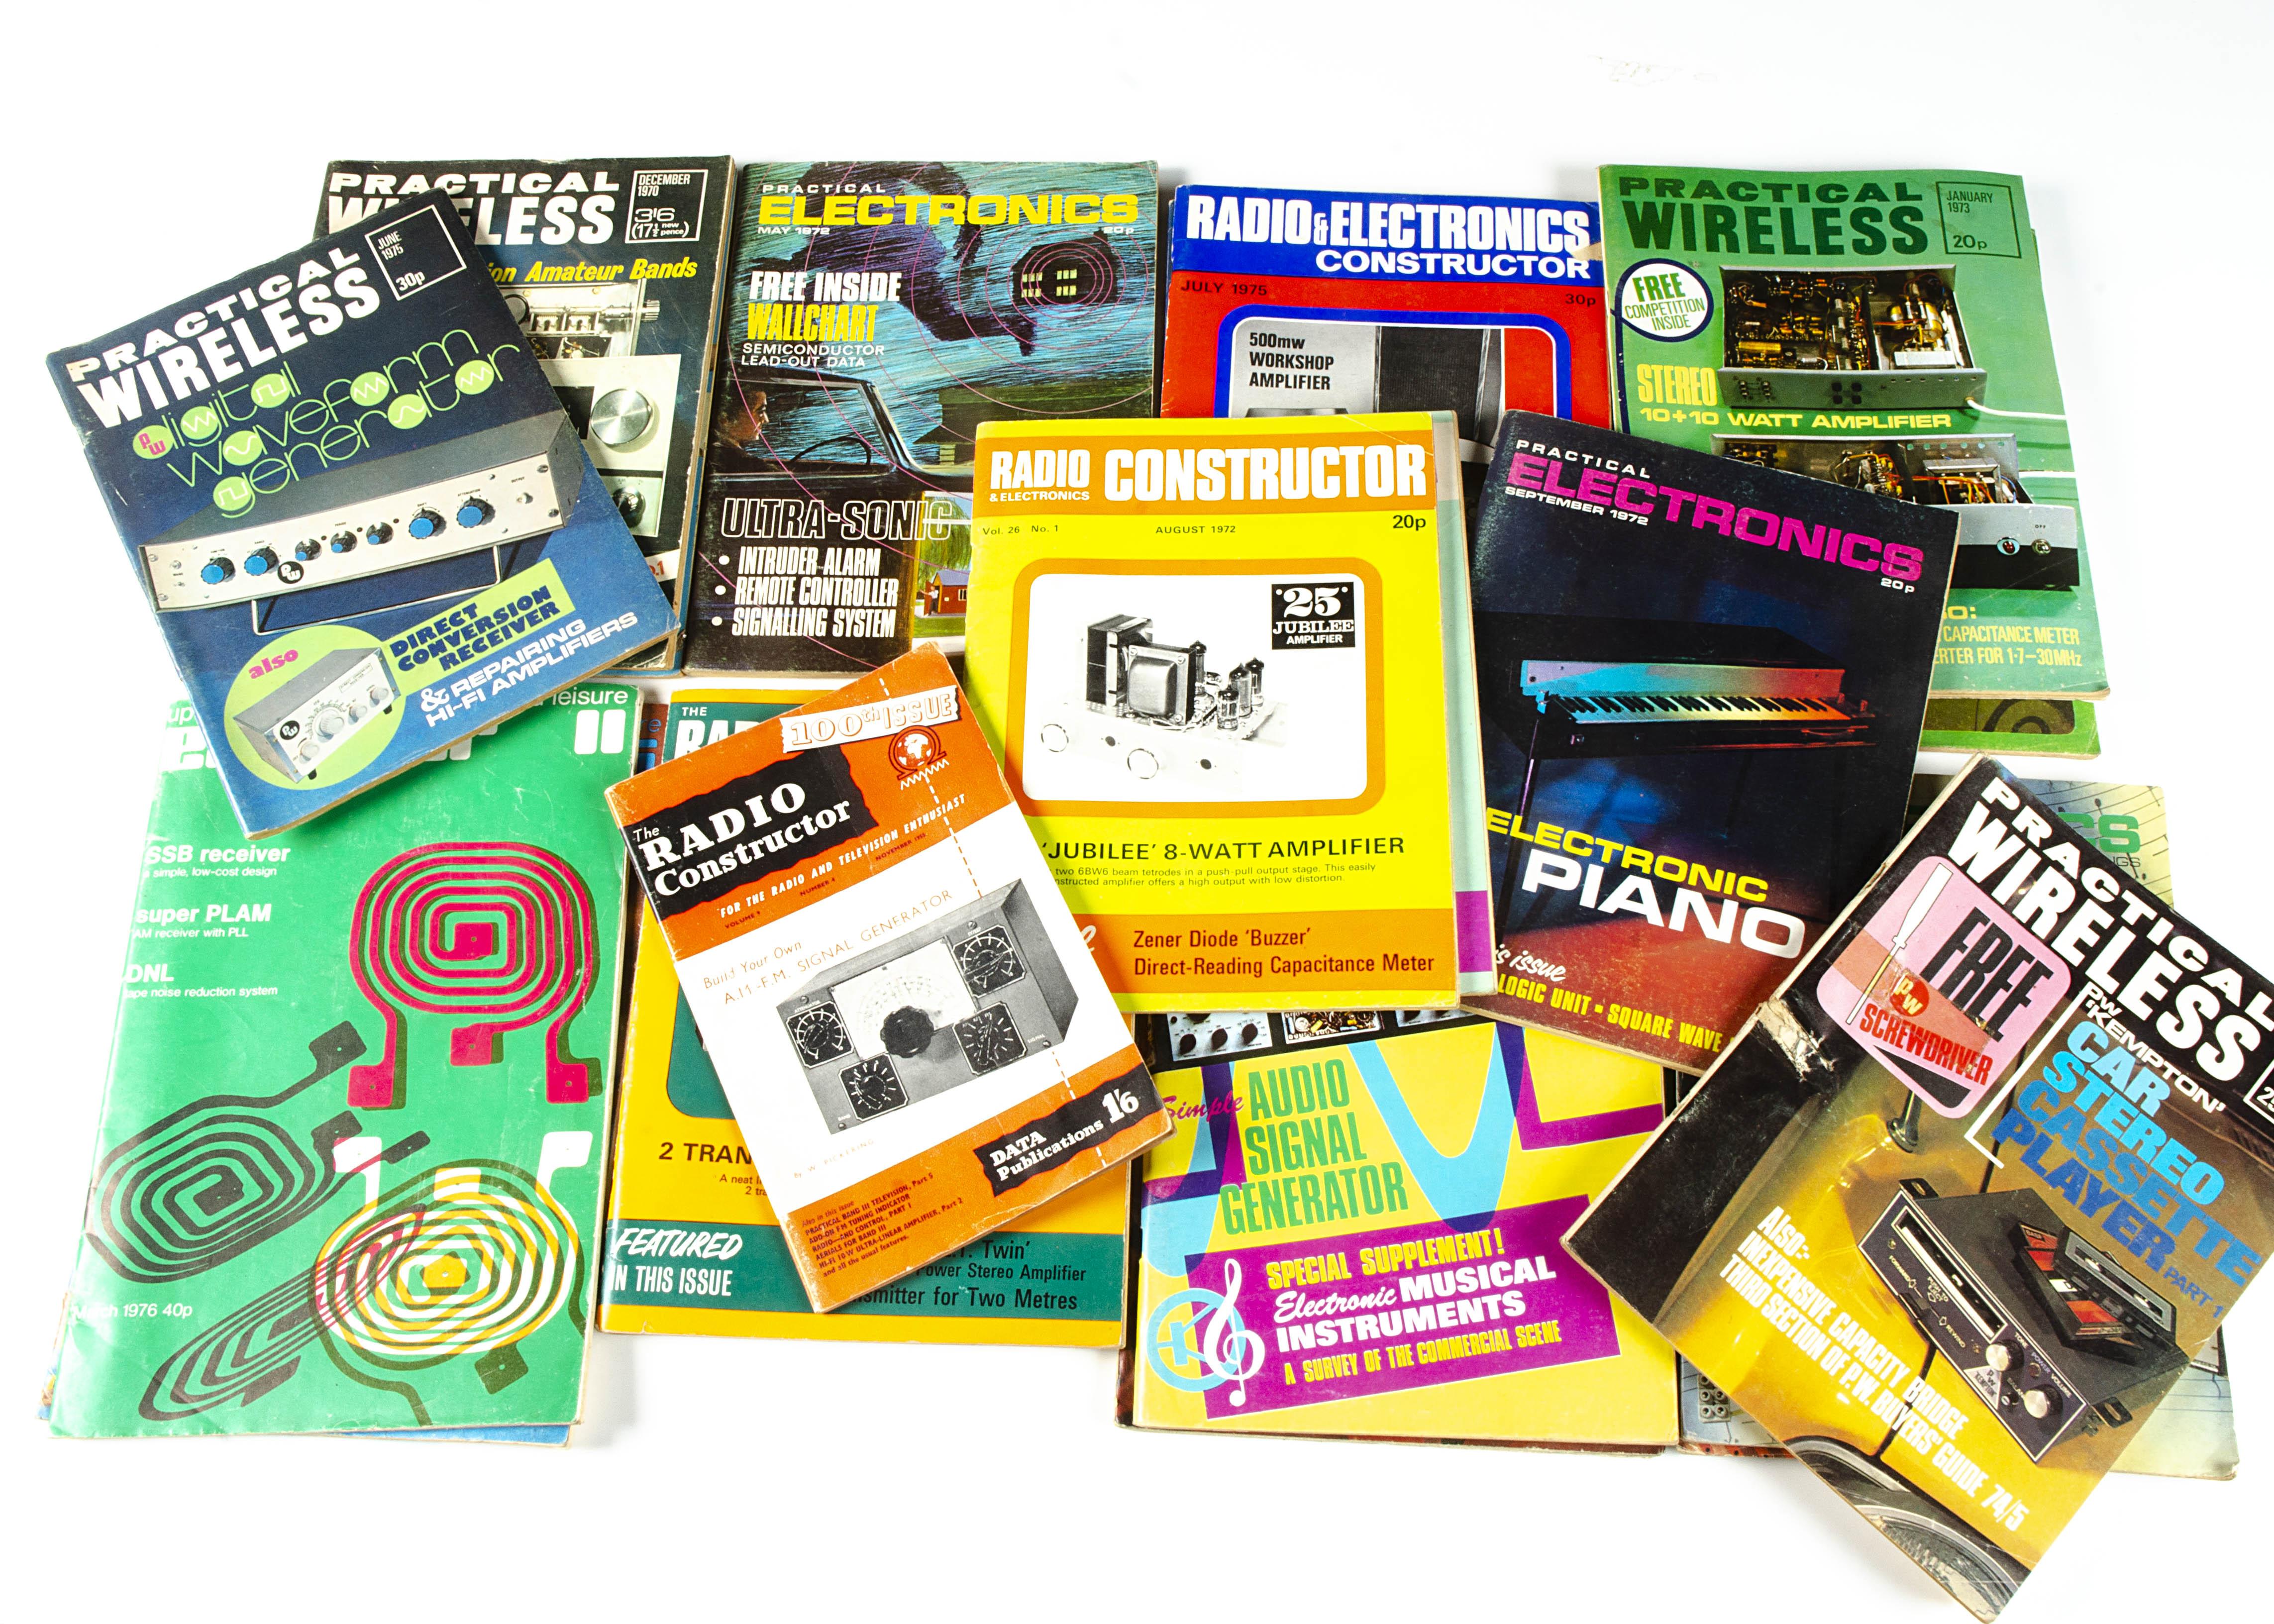 Radio Magazines, seven Practical Wireless, six Practical Electronics, four Radio Constructor, one